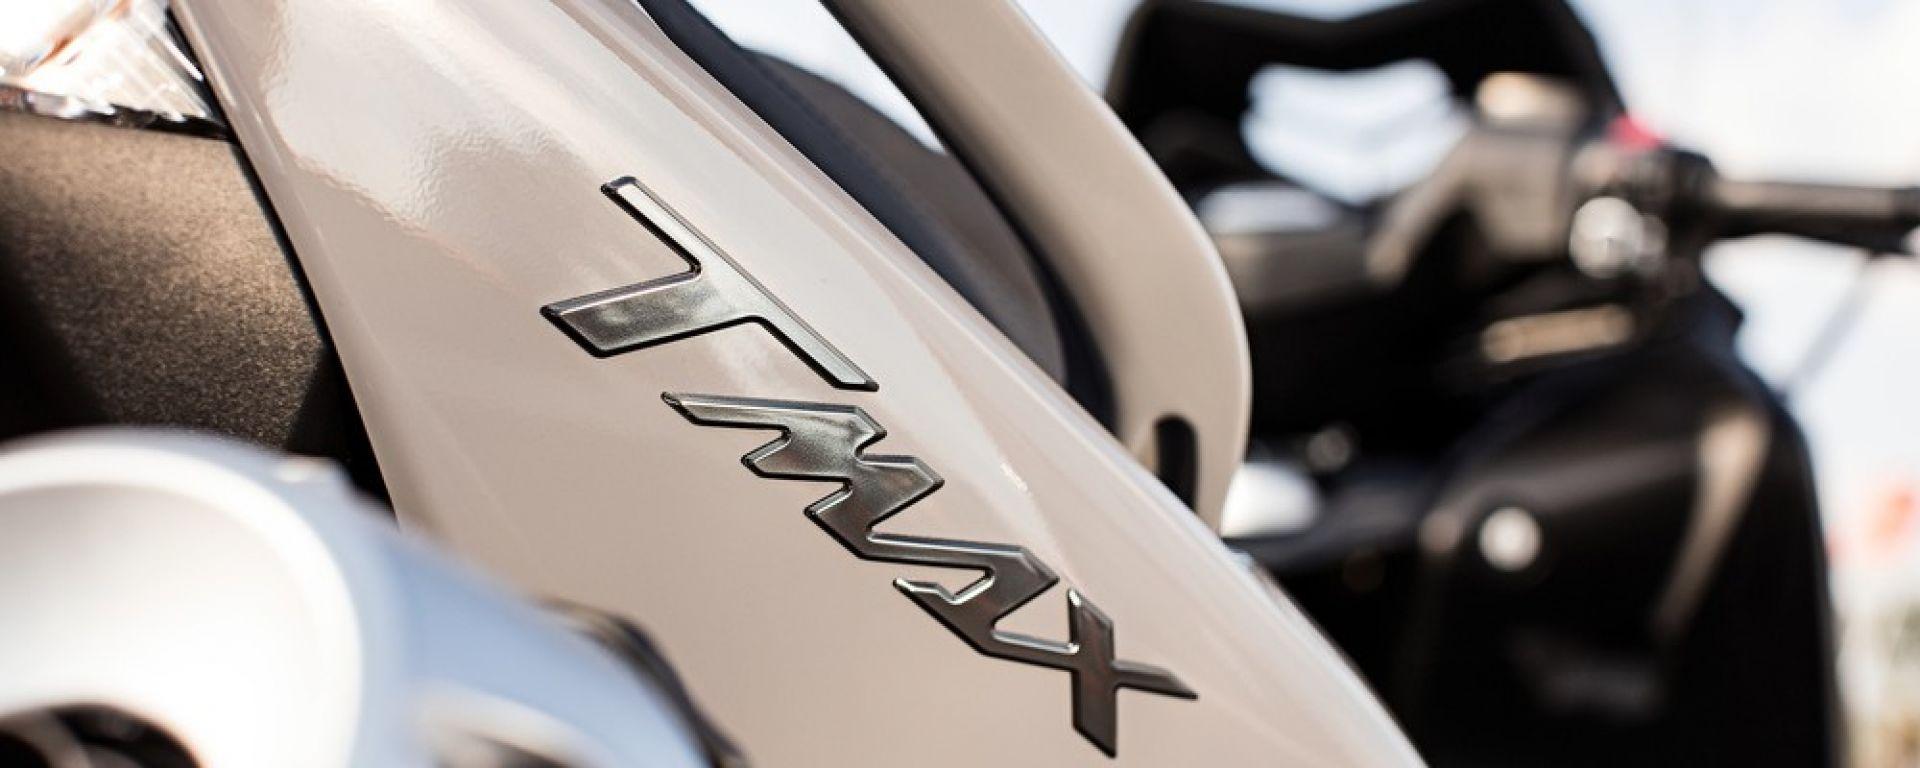 Yamaha T-Max Lux Max